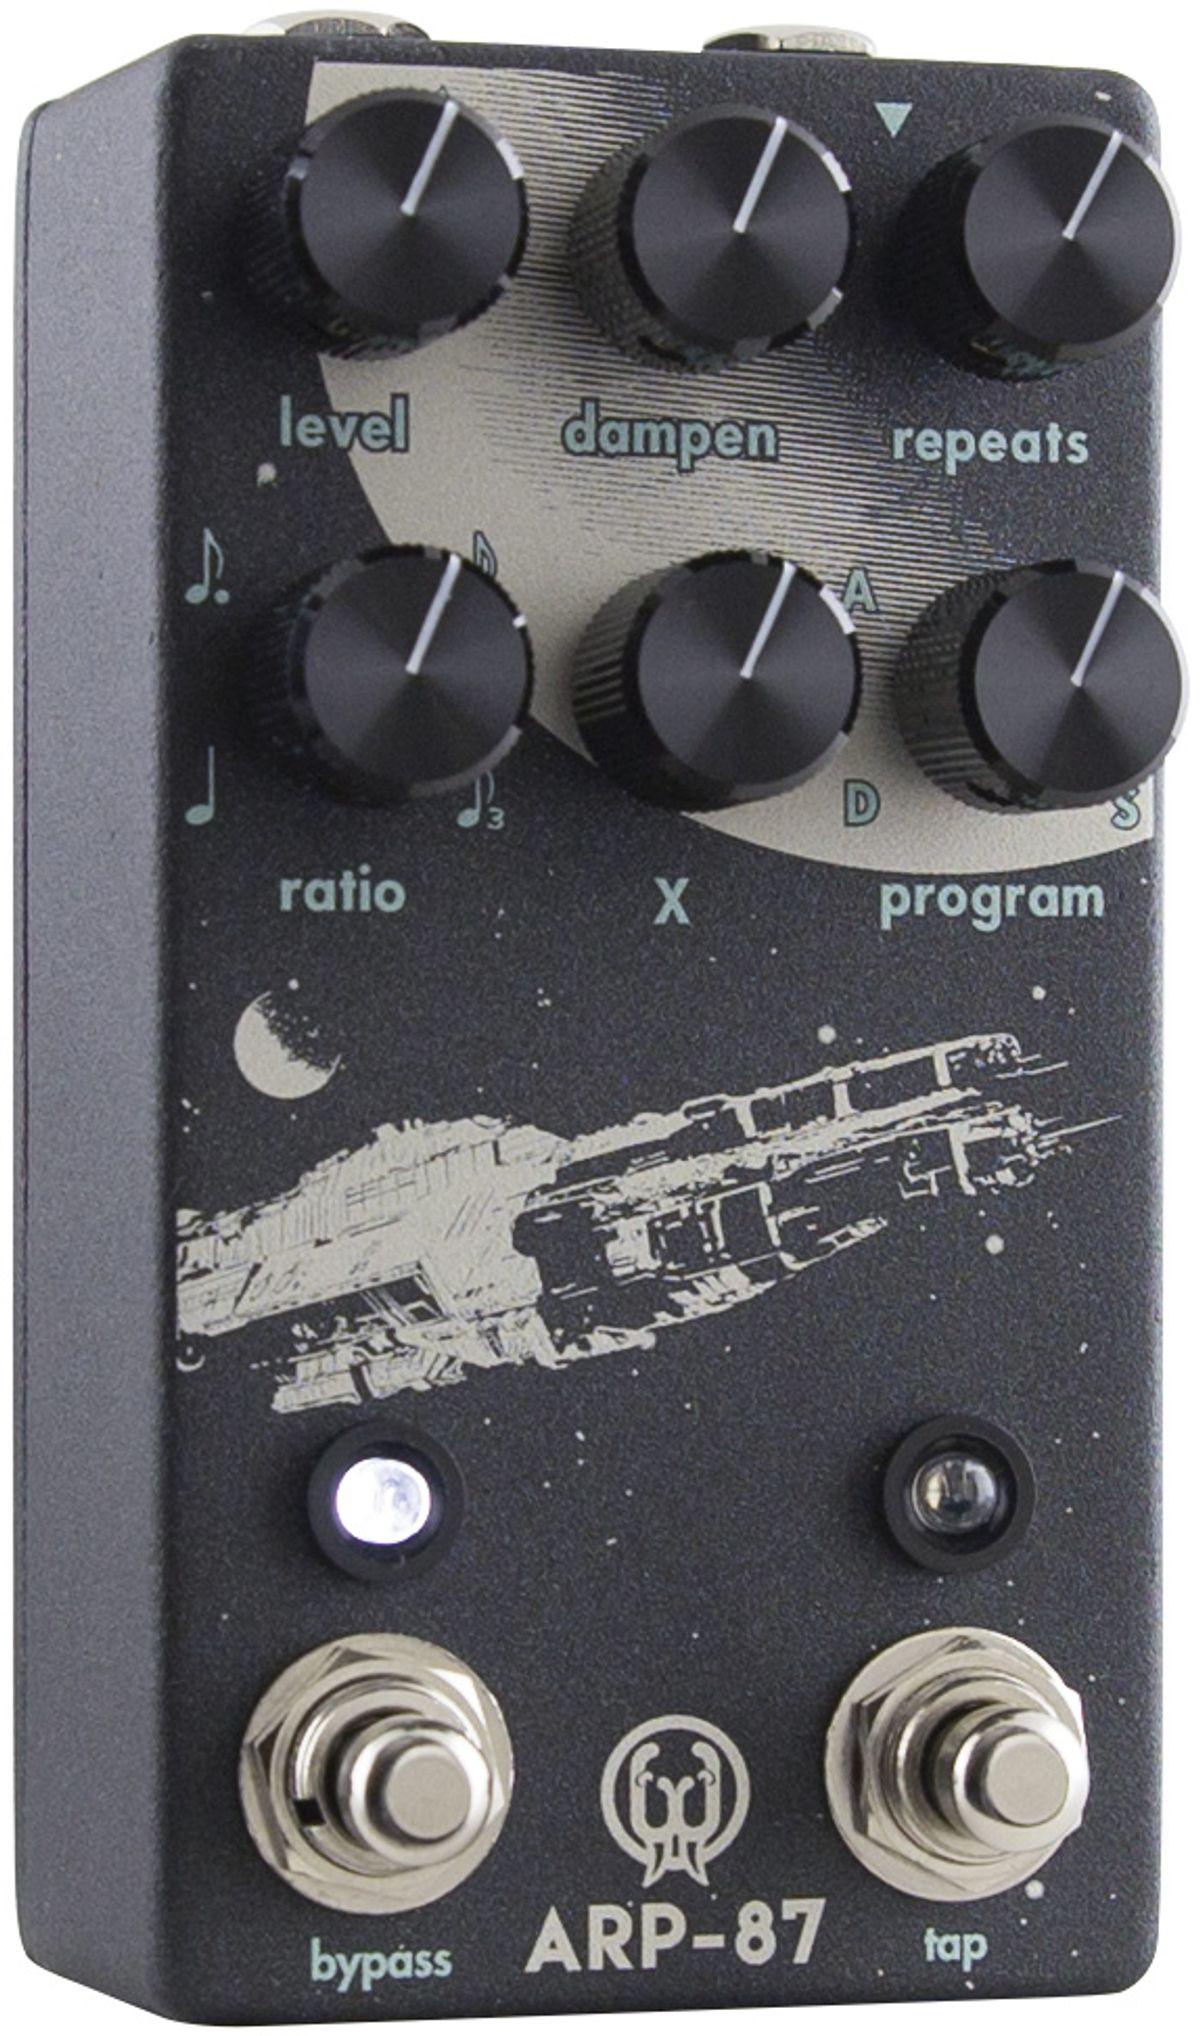 Walrus Audio ARP-87 Review